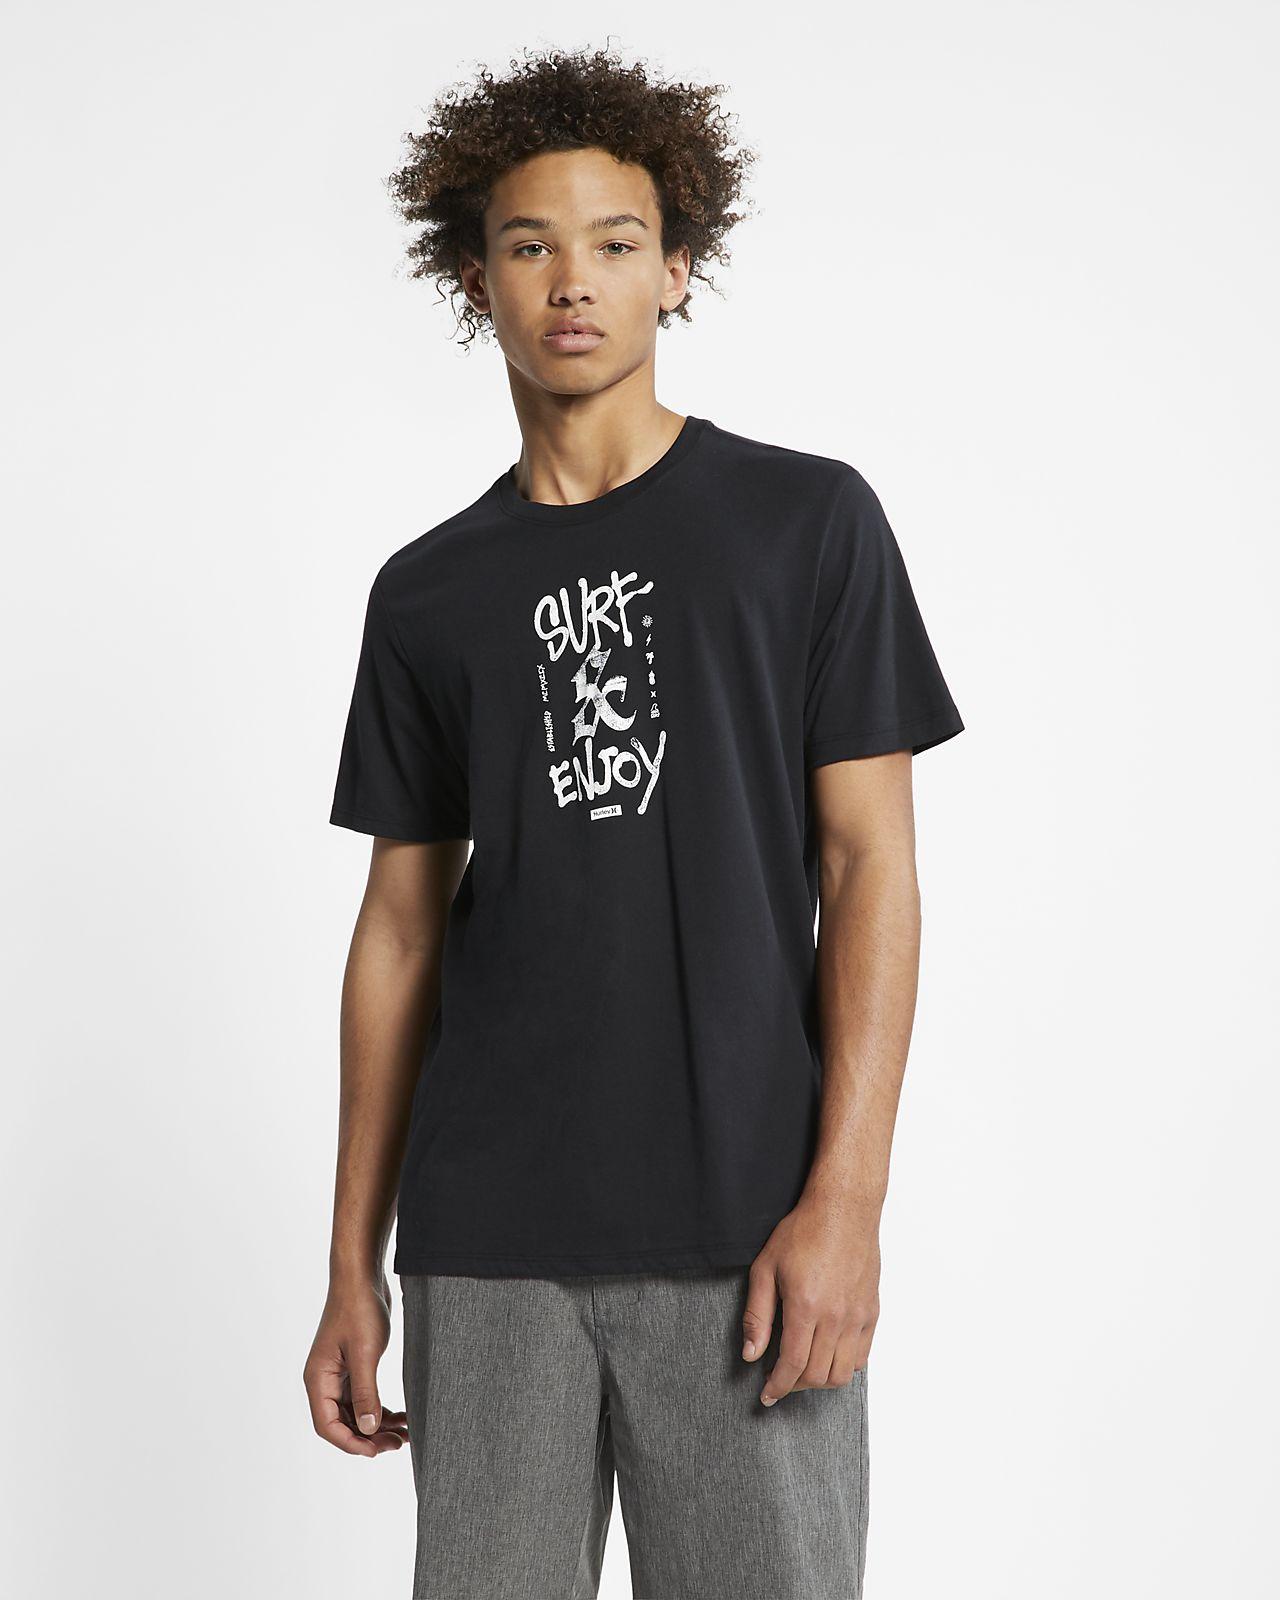 on sale c88eb eec56 ... T-shirt Hurley Dri-FIT Surf And Enjoy för män